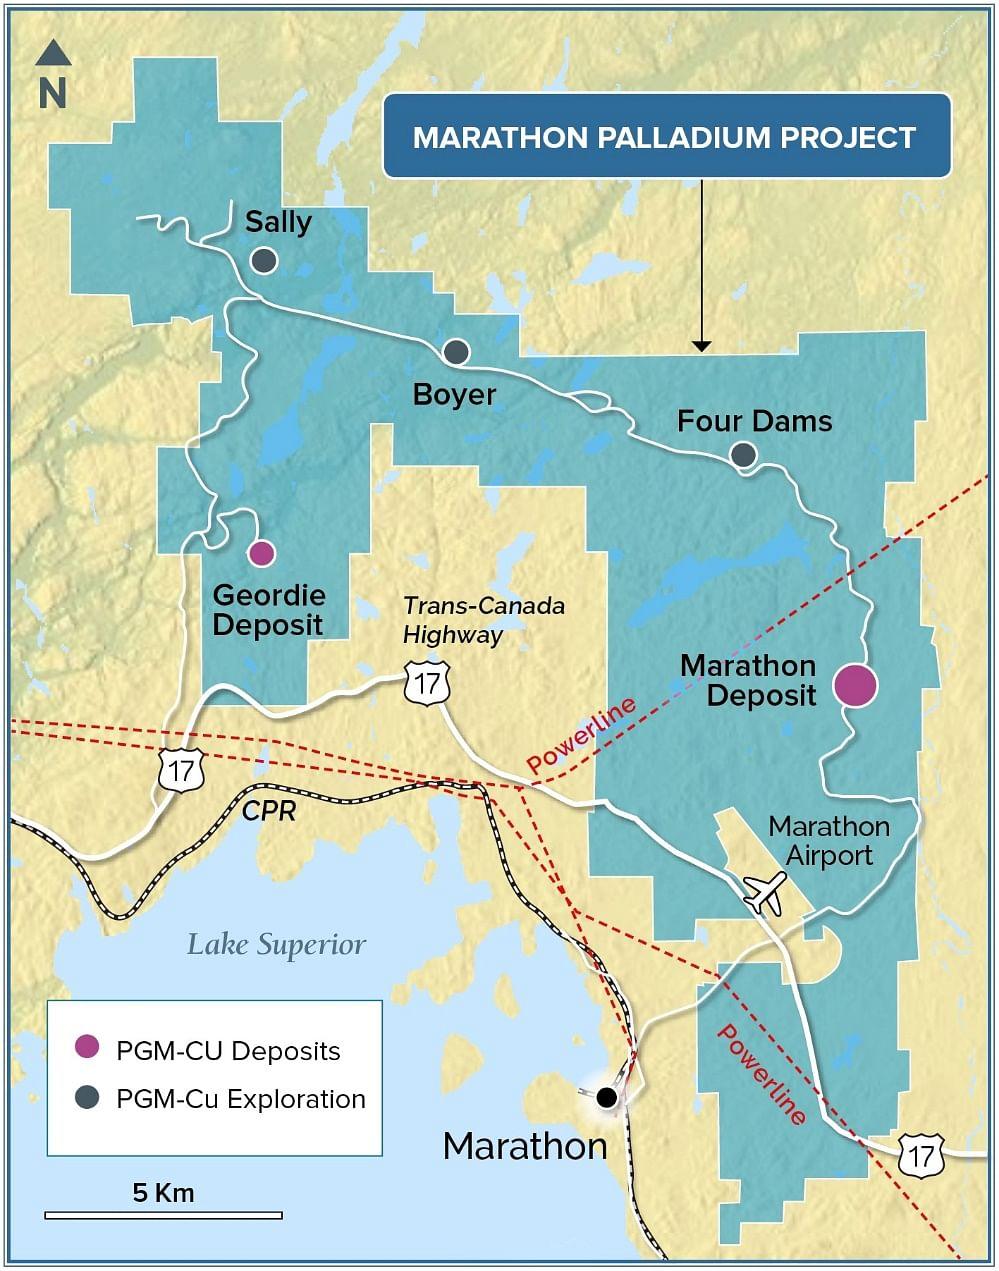 Generation Mining Palladium Mineralization at Marathon Deposit